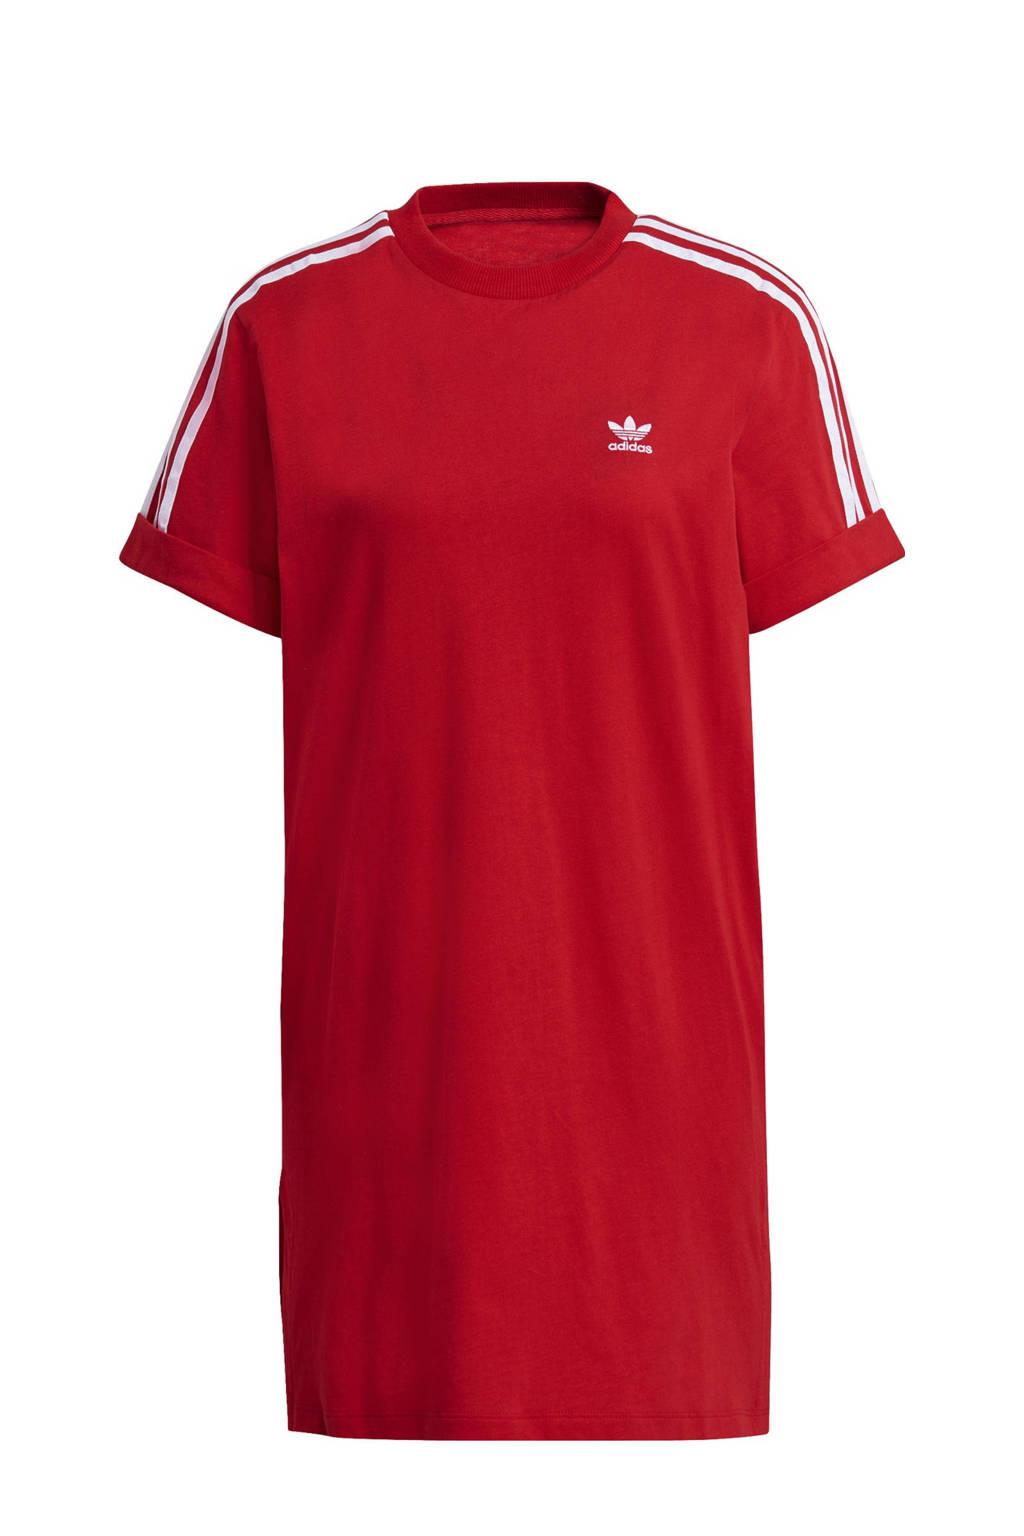 adidas Originals Adicolor T-shirt jurk rood, Rood